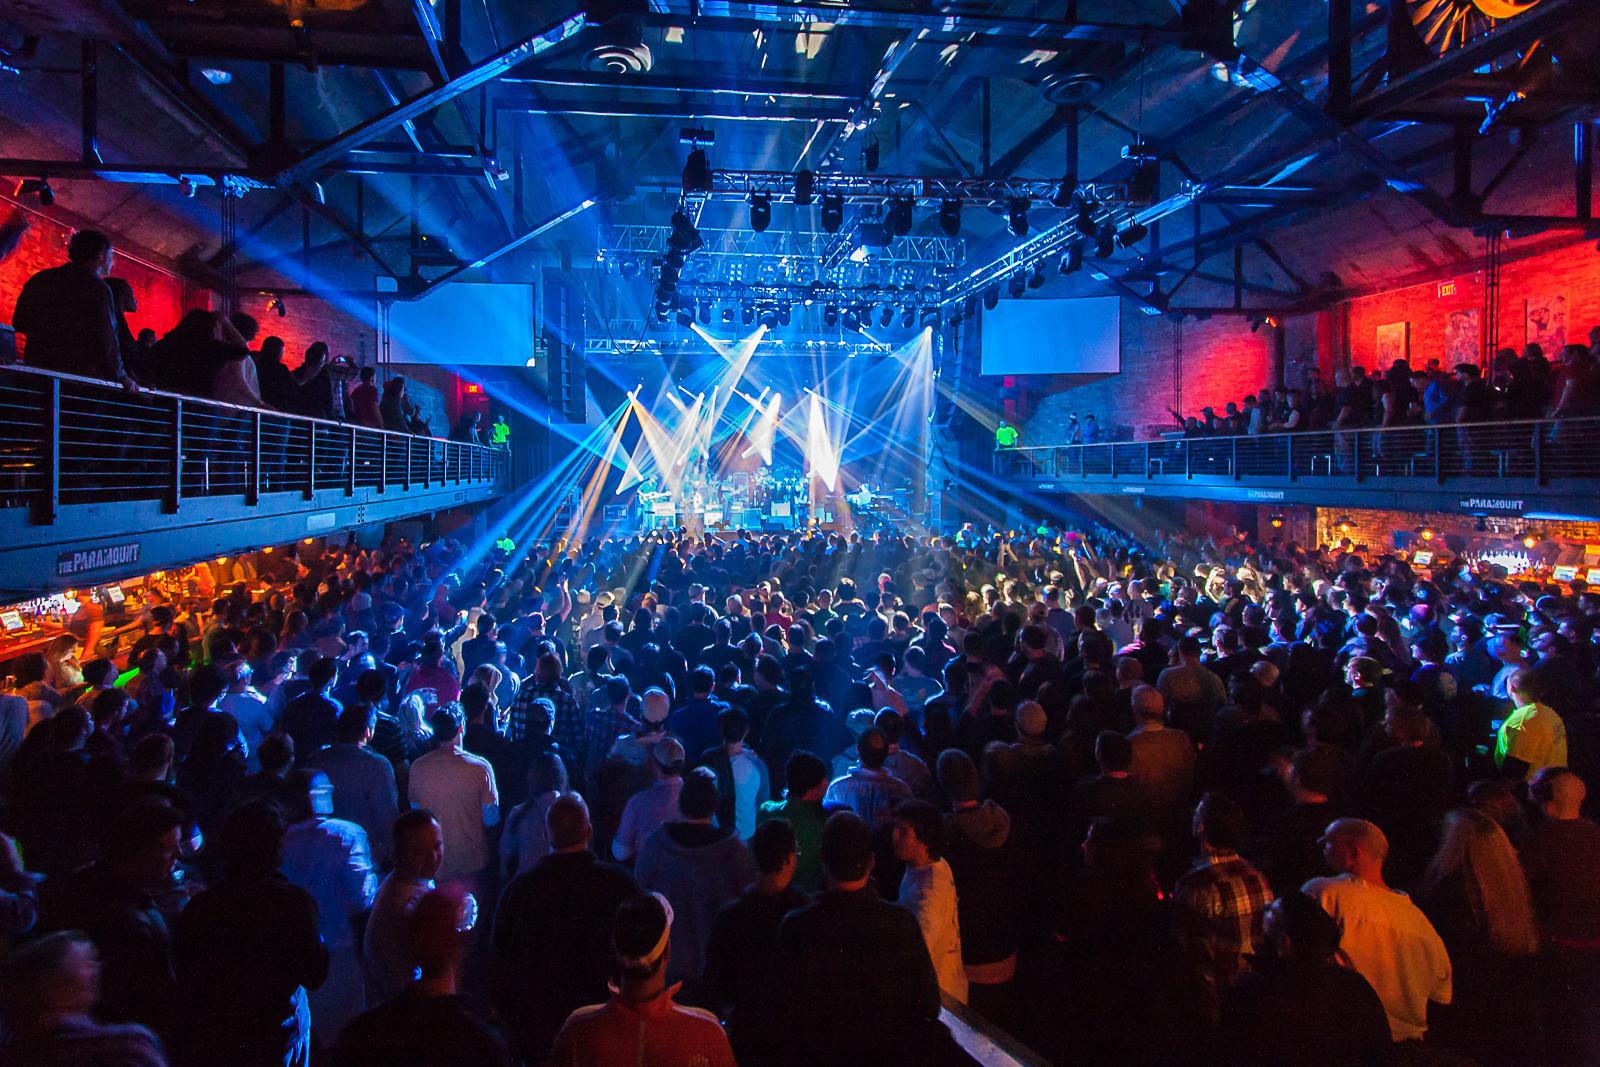 Baltimore Music Venues - Baltimore Concert Venues | Visit ...